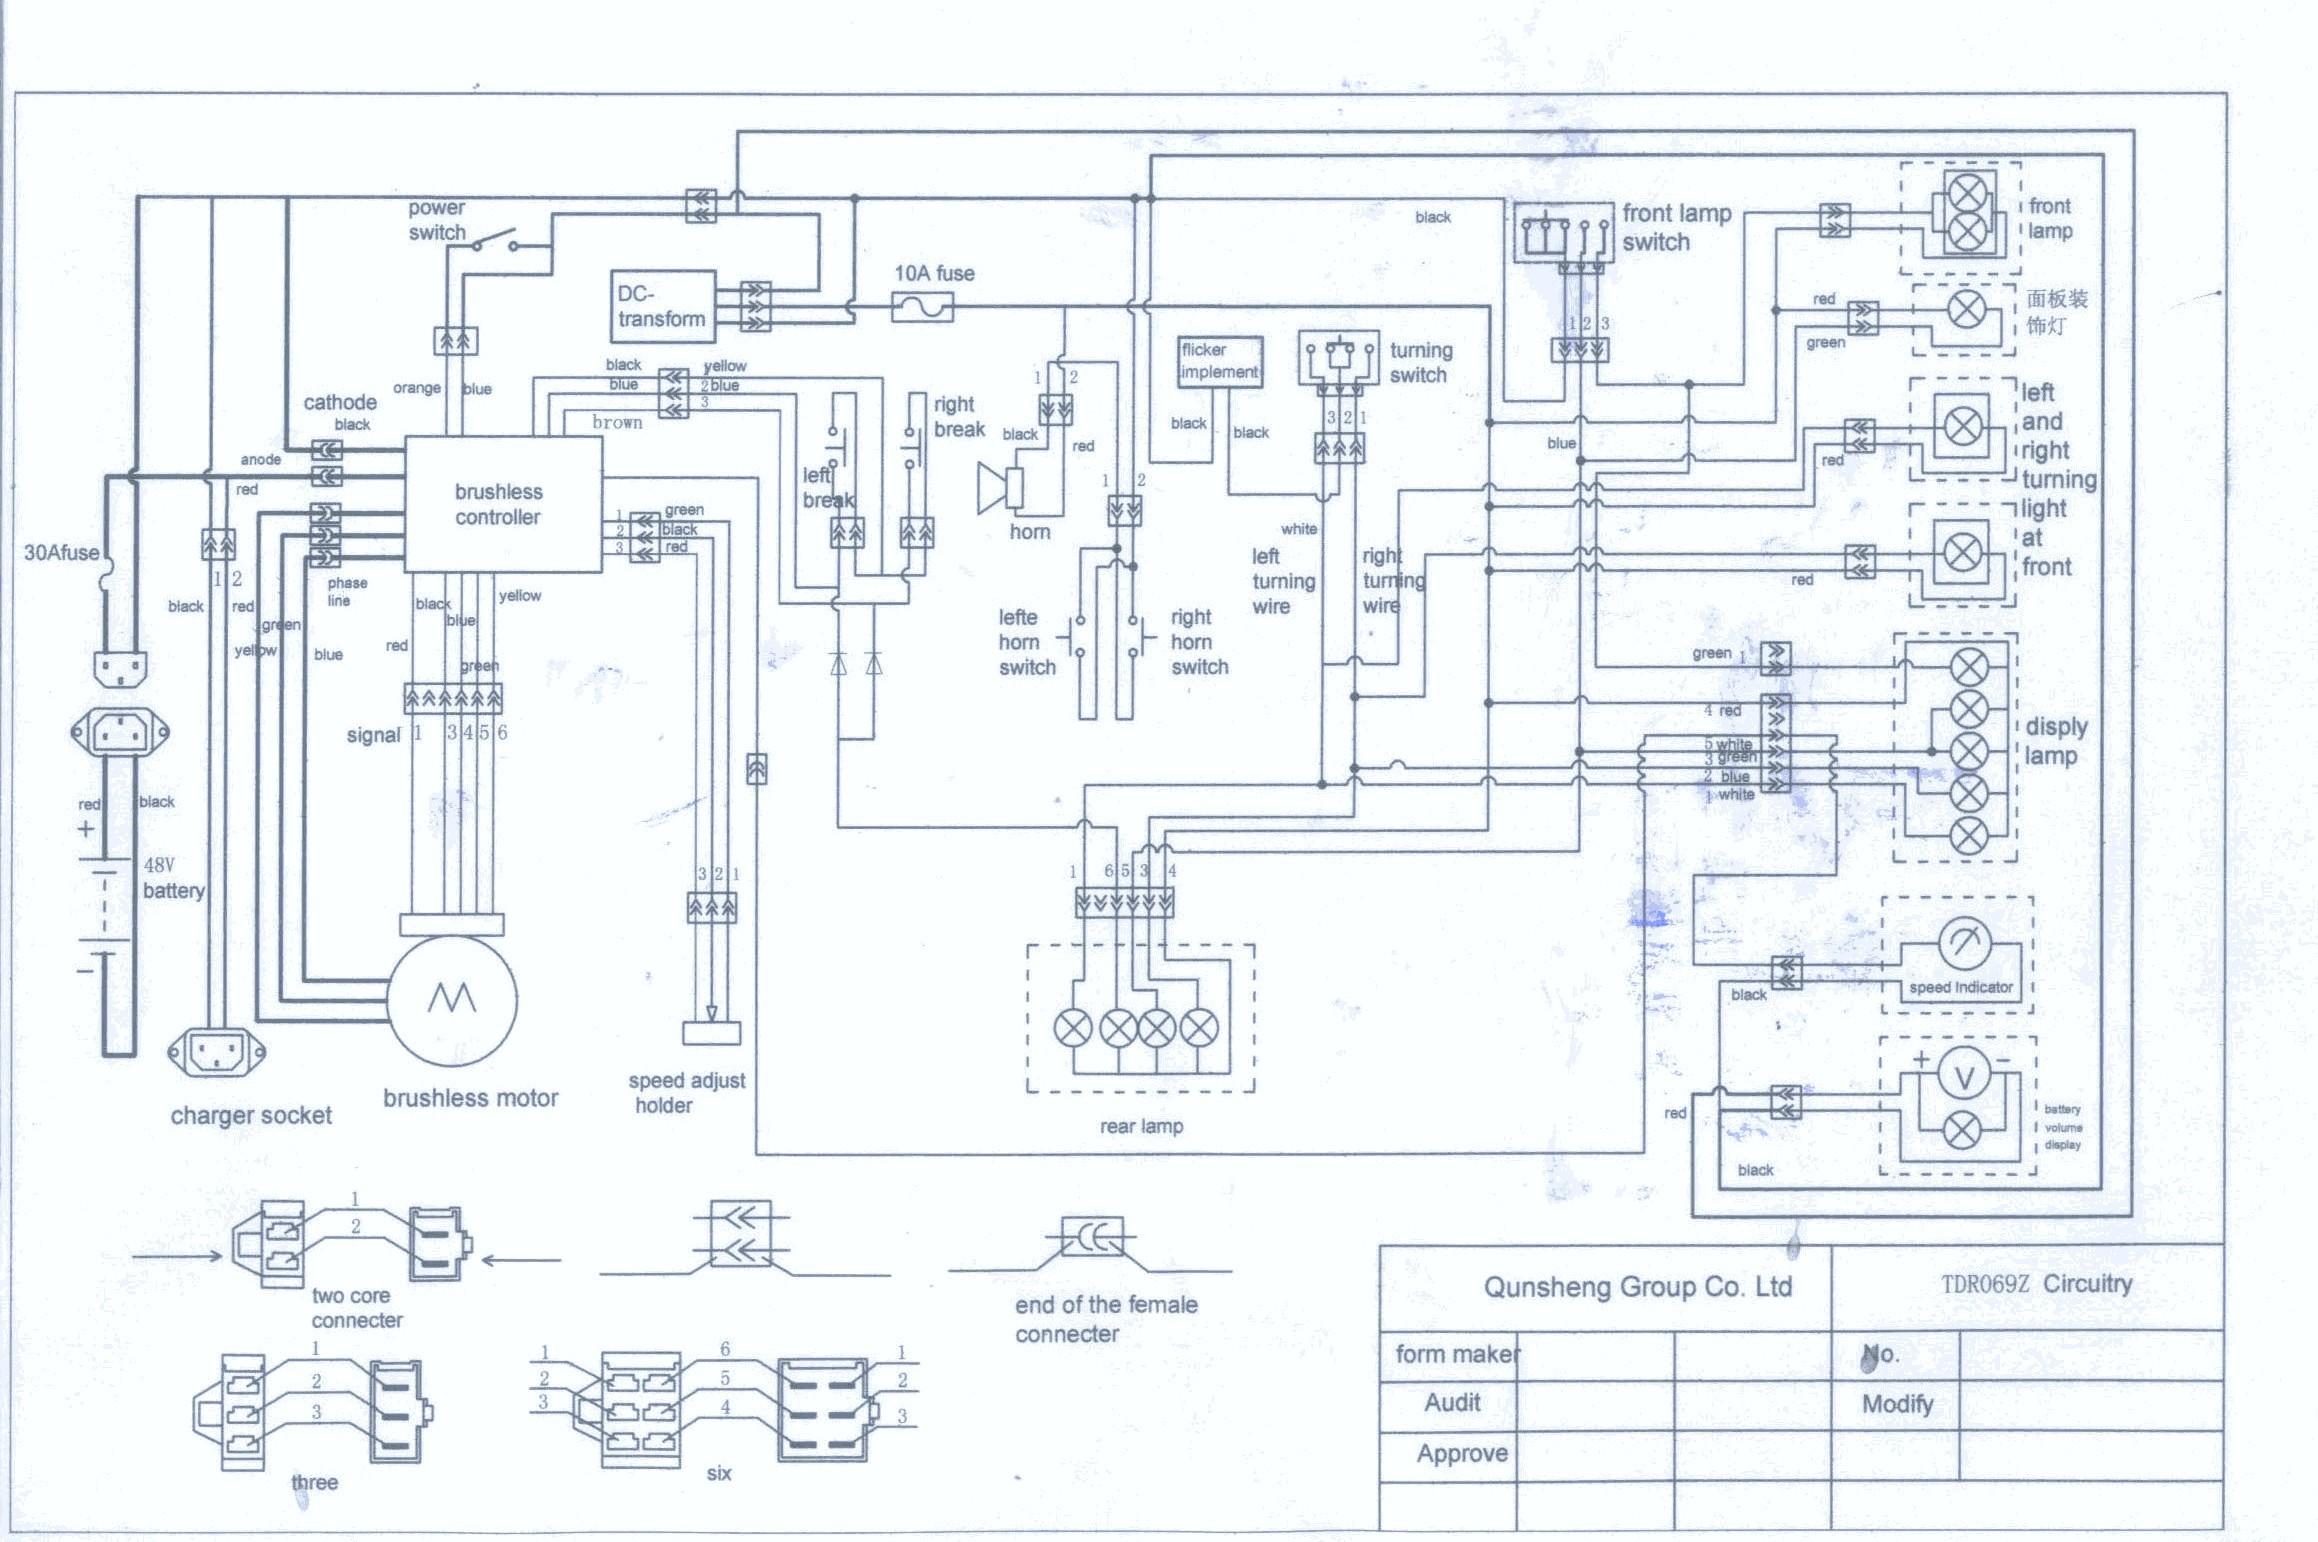 4020 12 Volt Wiring Diagram Be6 Schumacher Battery Charger Wiring Diagram 30 Of 4020 12 Volt Wiring Diagram